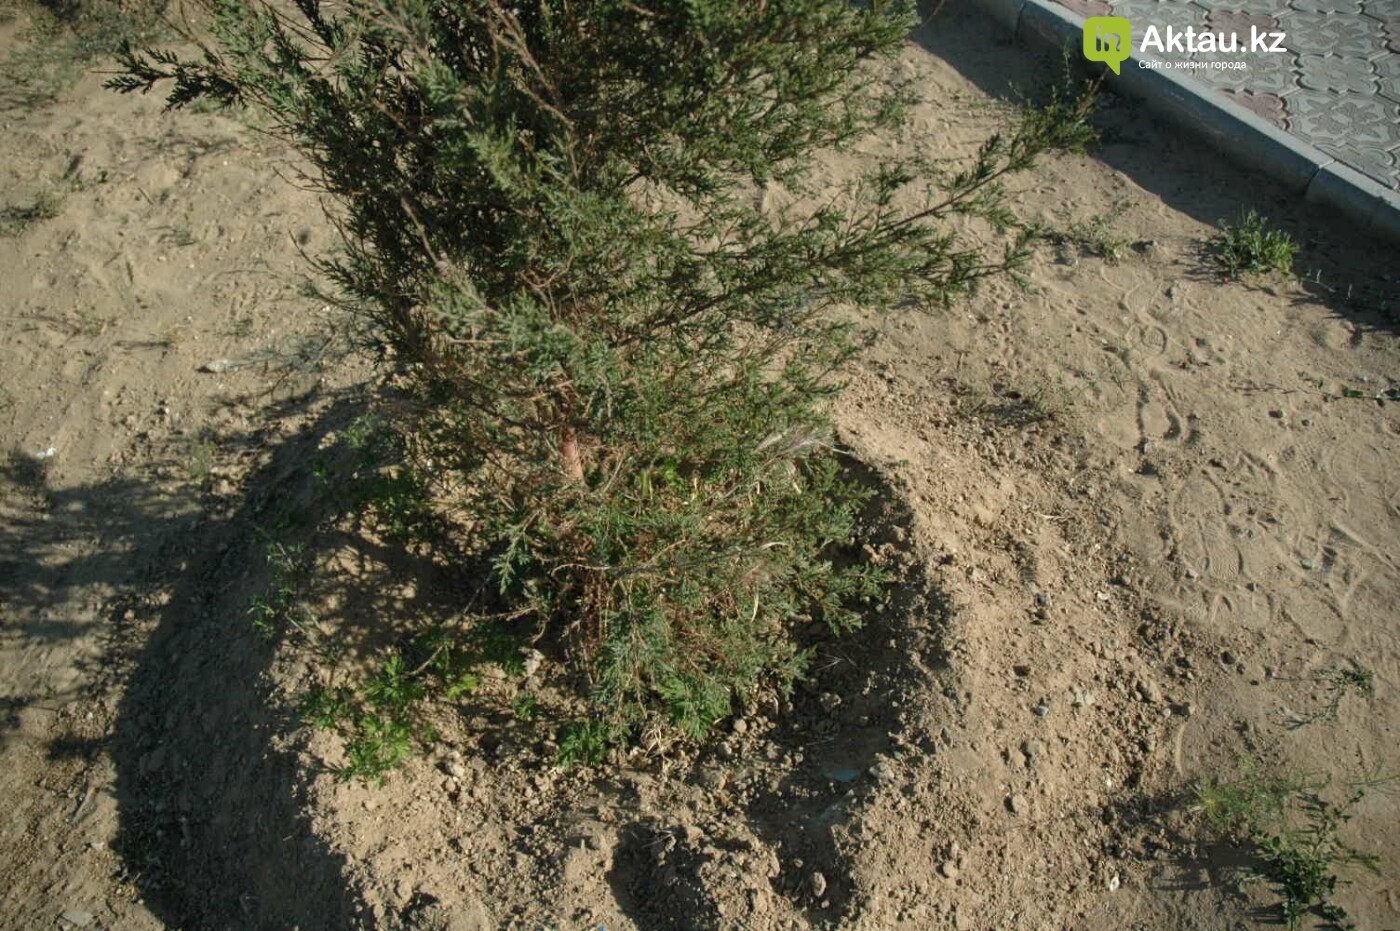 Погибшие от засухи и обезвоживания в Актау исчисляются десятками (ФОТО), фото-35